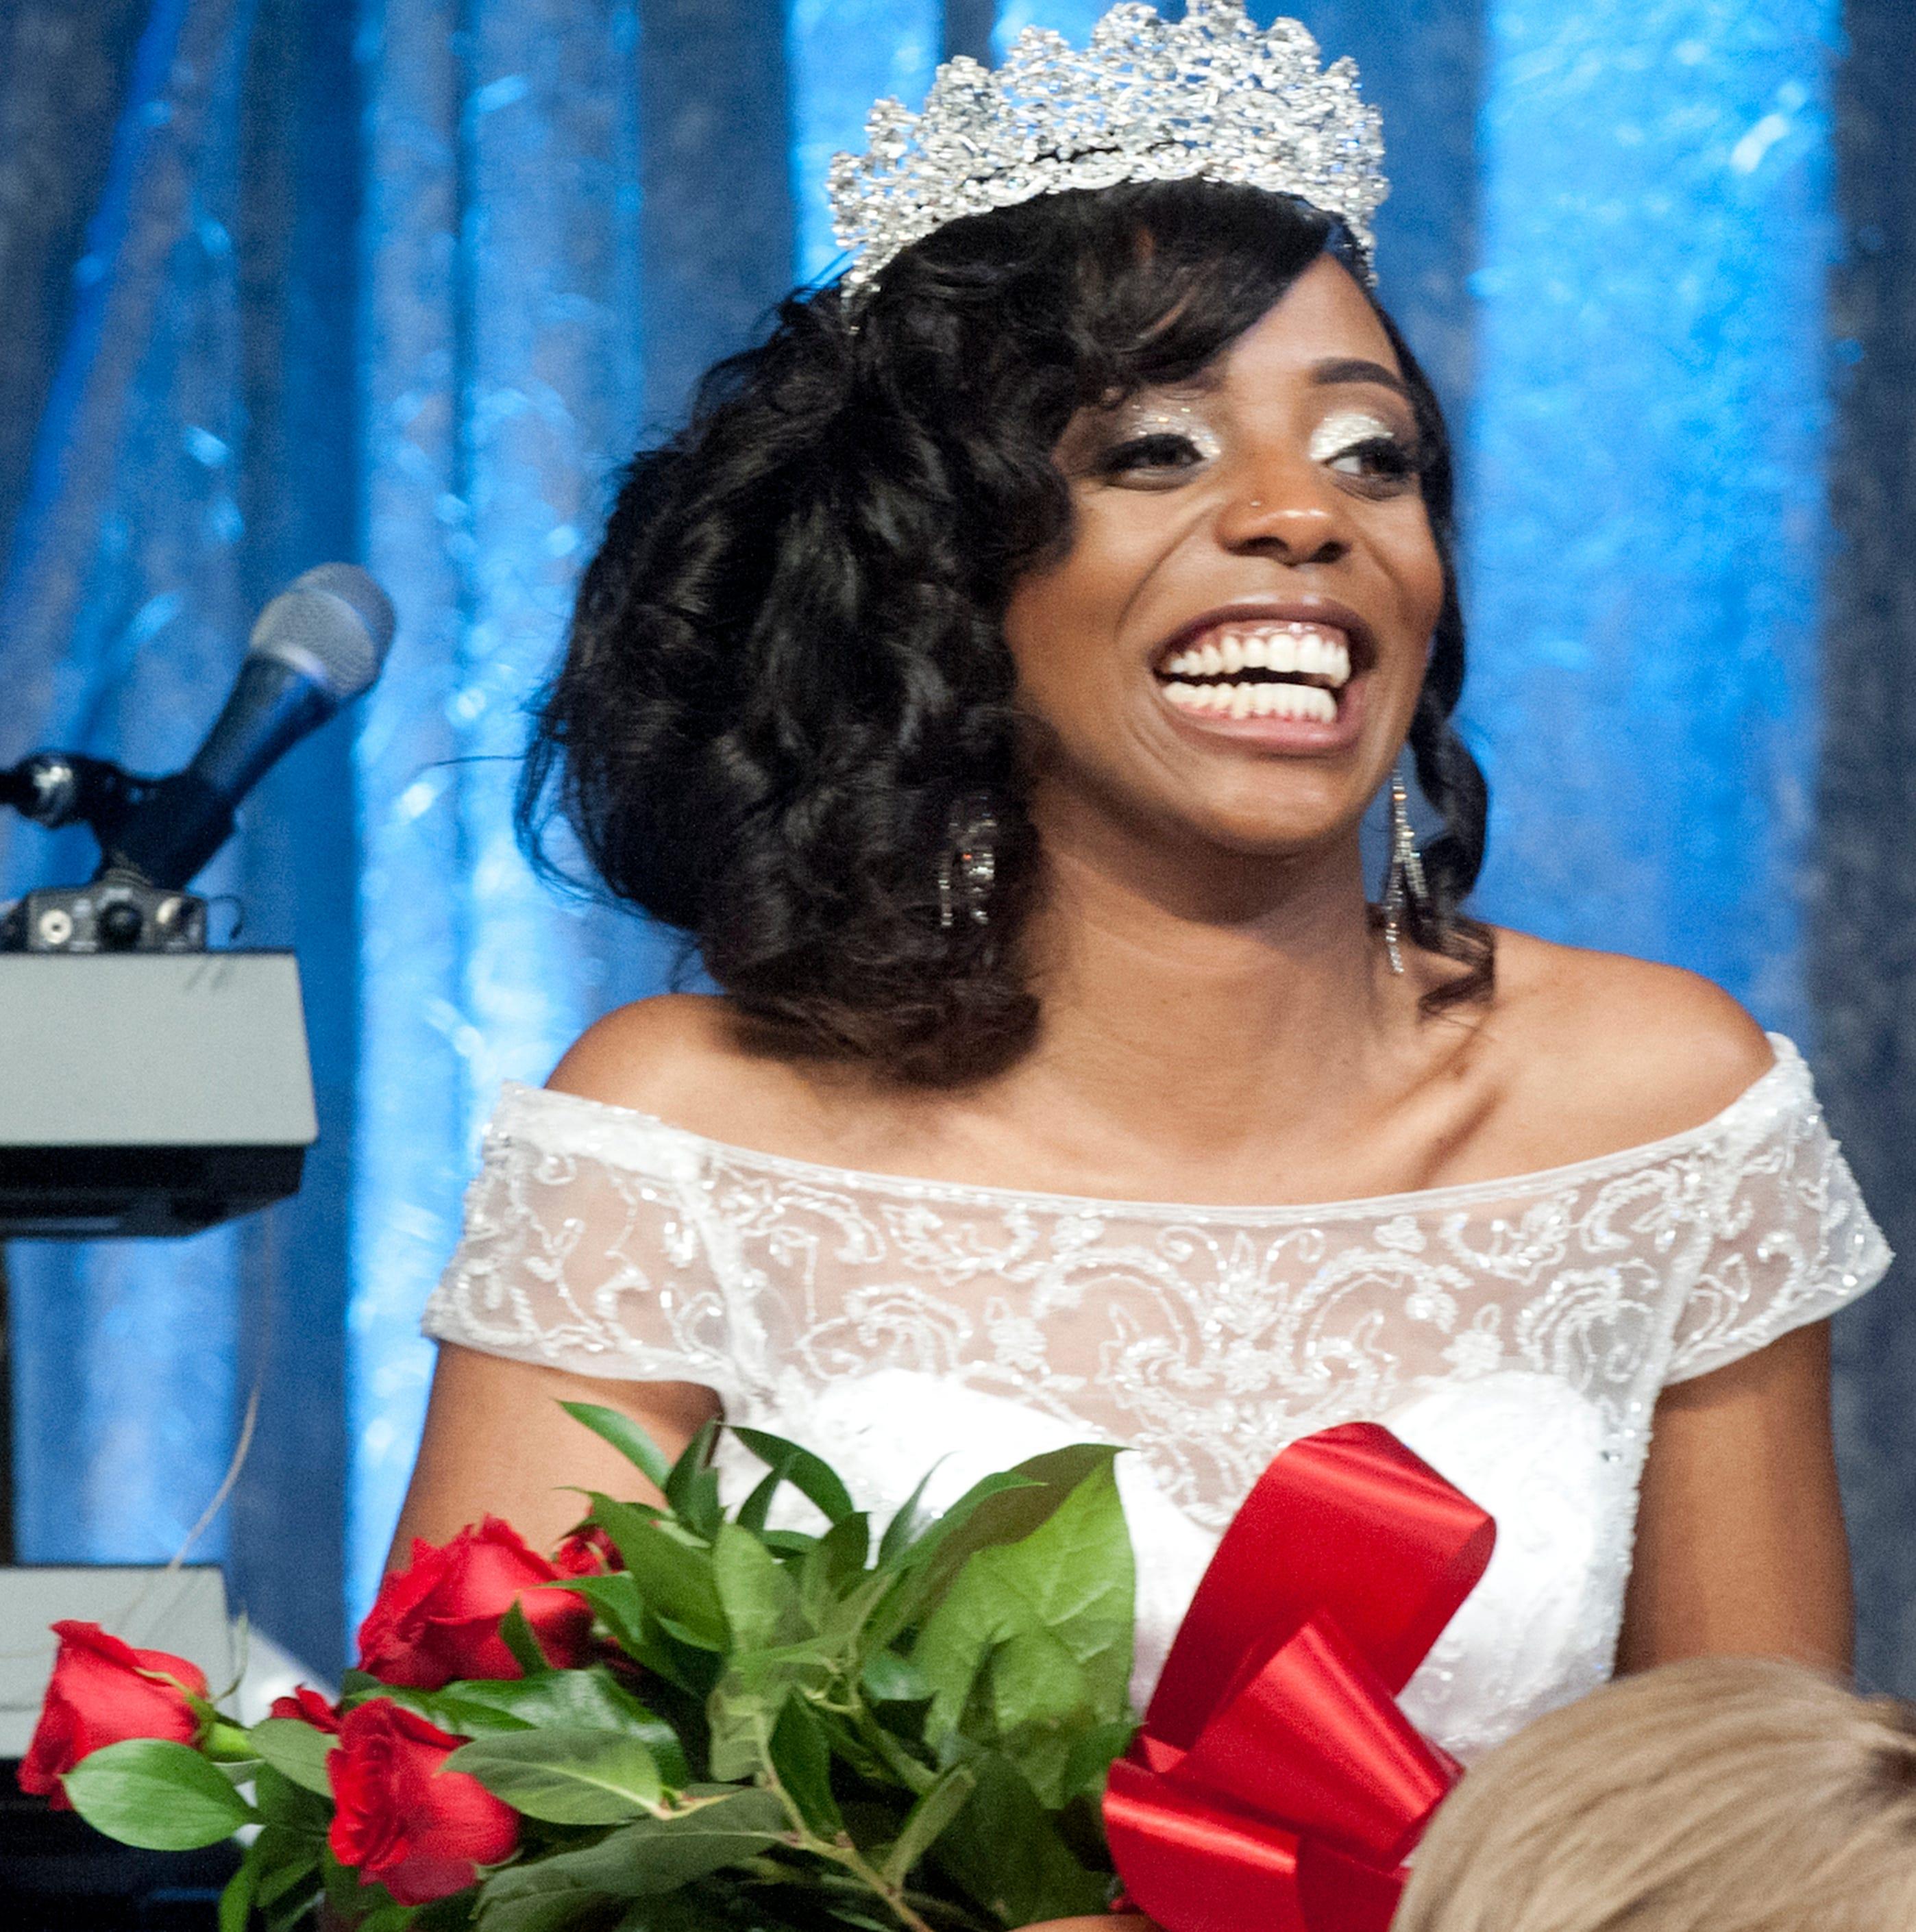 University of Louisville senior crowned Kentucky Derby Festival Queen